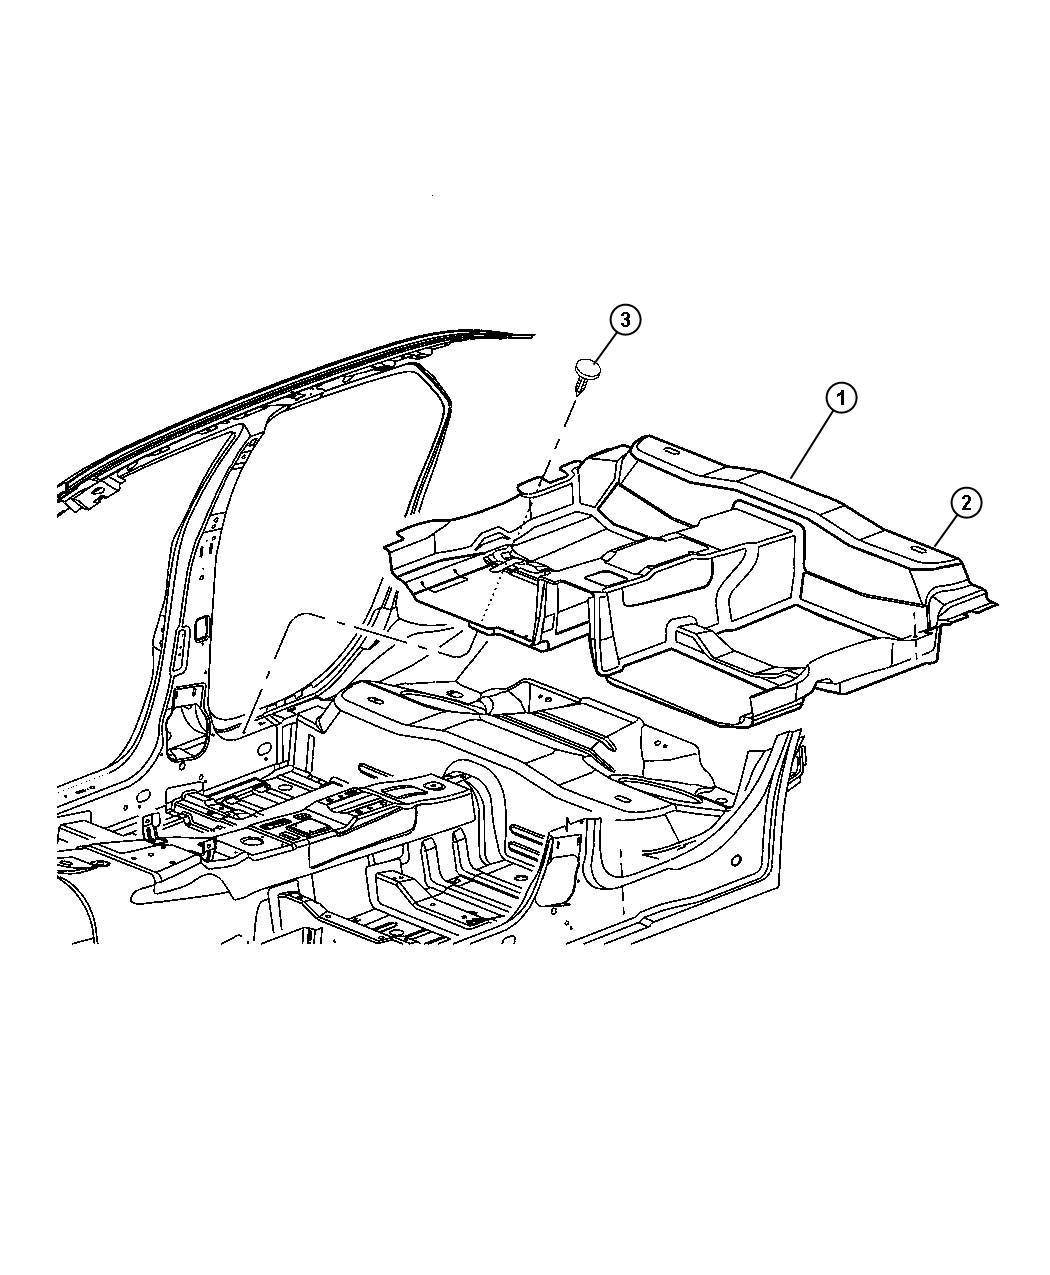 Dodge Charger Carpet. Floor console. [j1], [j1][floor